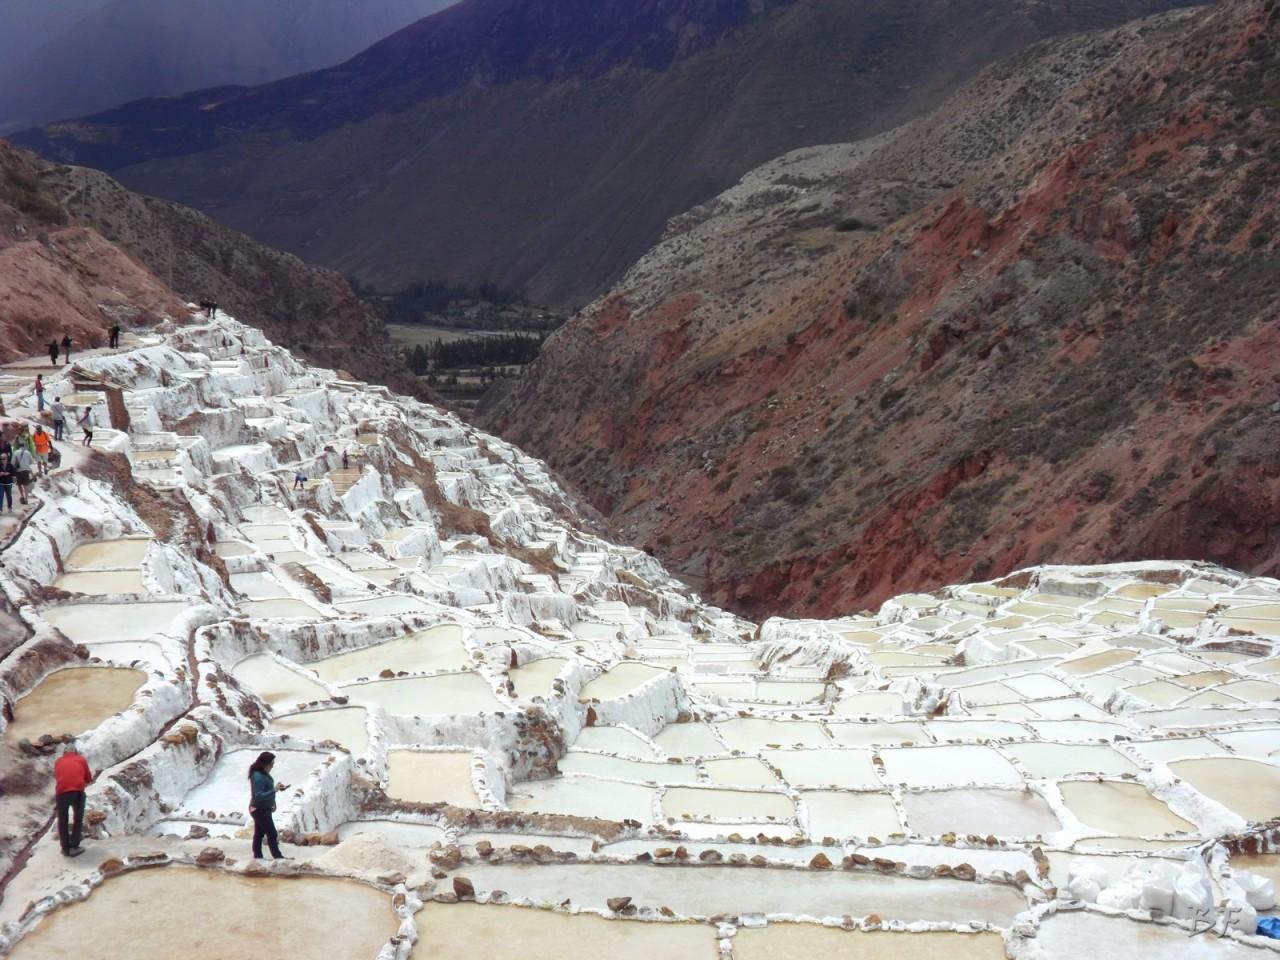 Terrazze-Circolari-Megaliti-Moray-Saline-Maras-Cusco-Perù-14